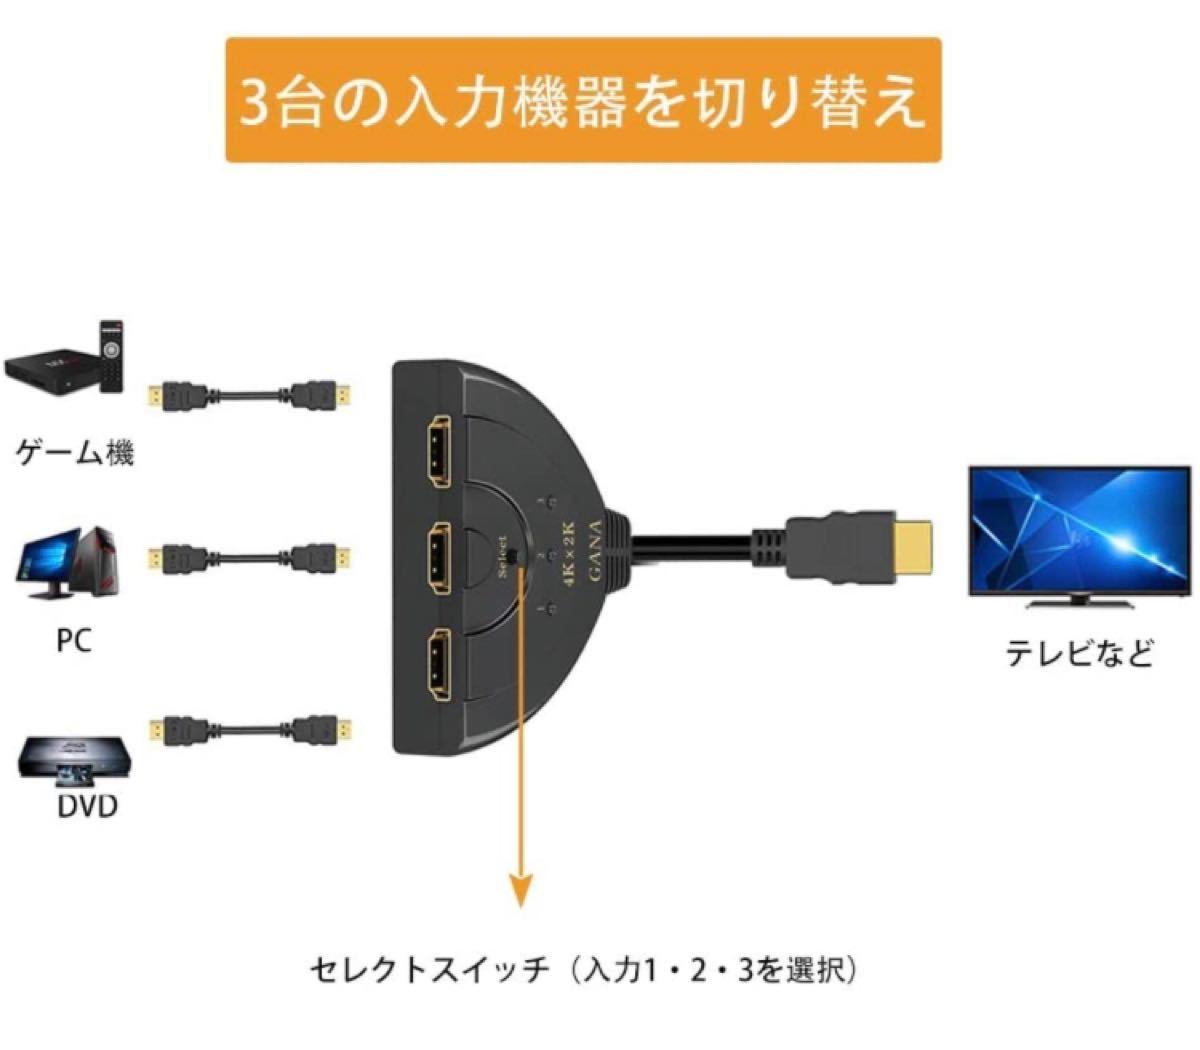 HDMI切替器 4Kx2K HDMI分配器/セレクター 3入力1出力金メッキコネクタ 1080p/3D対応(メス→オス) 電源不要